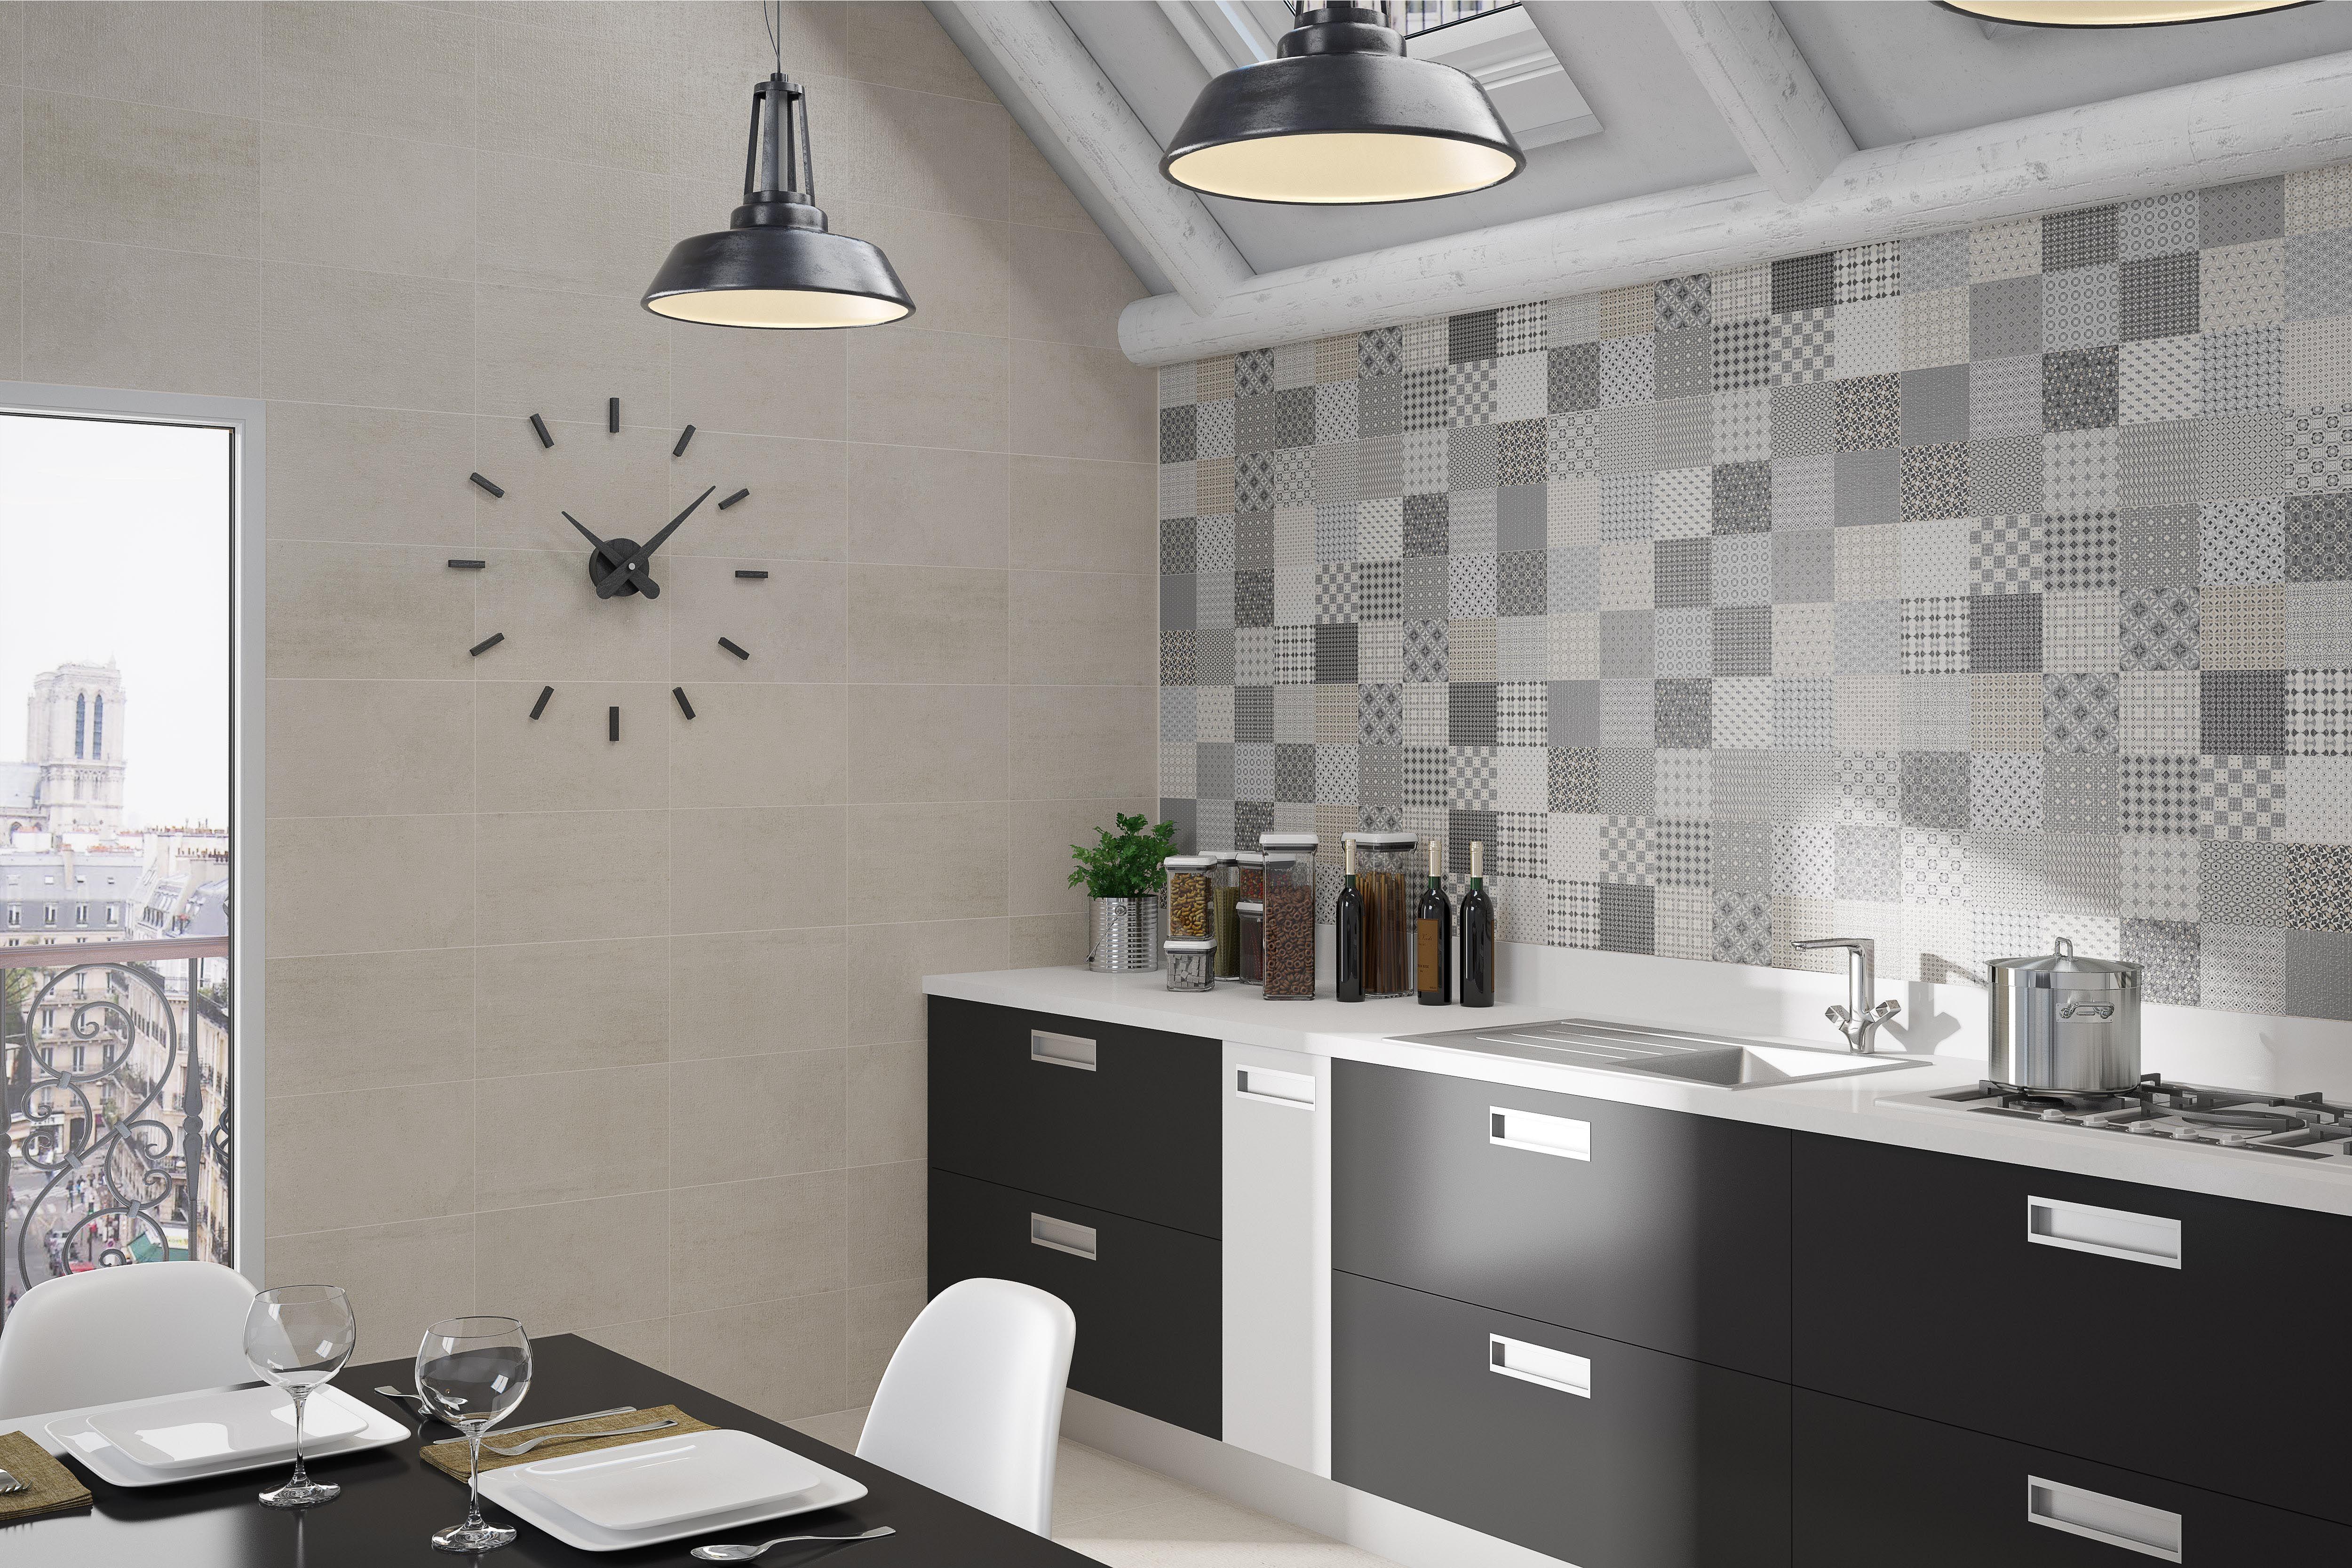 Kitchen Wall Tiles Uk Kitchen Decoration Ideas Pinterest Wall